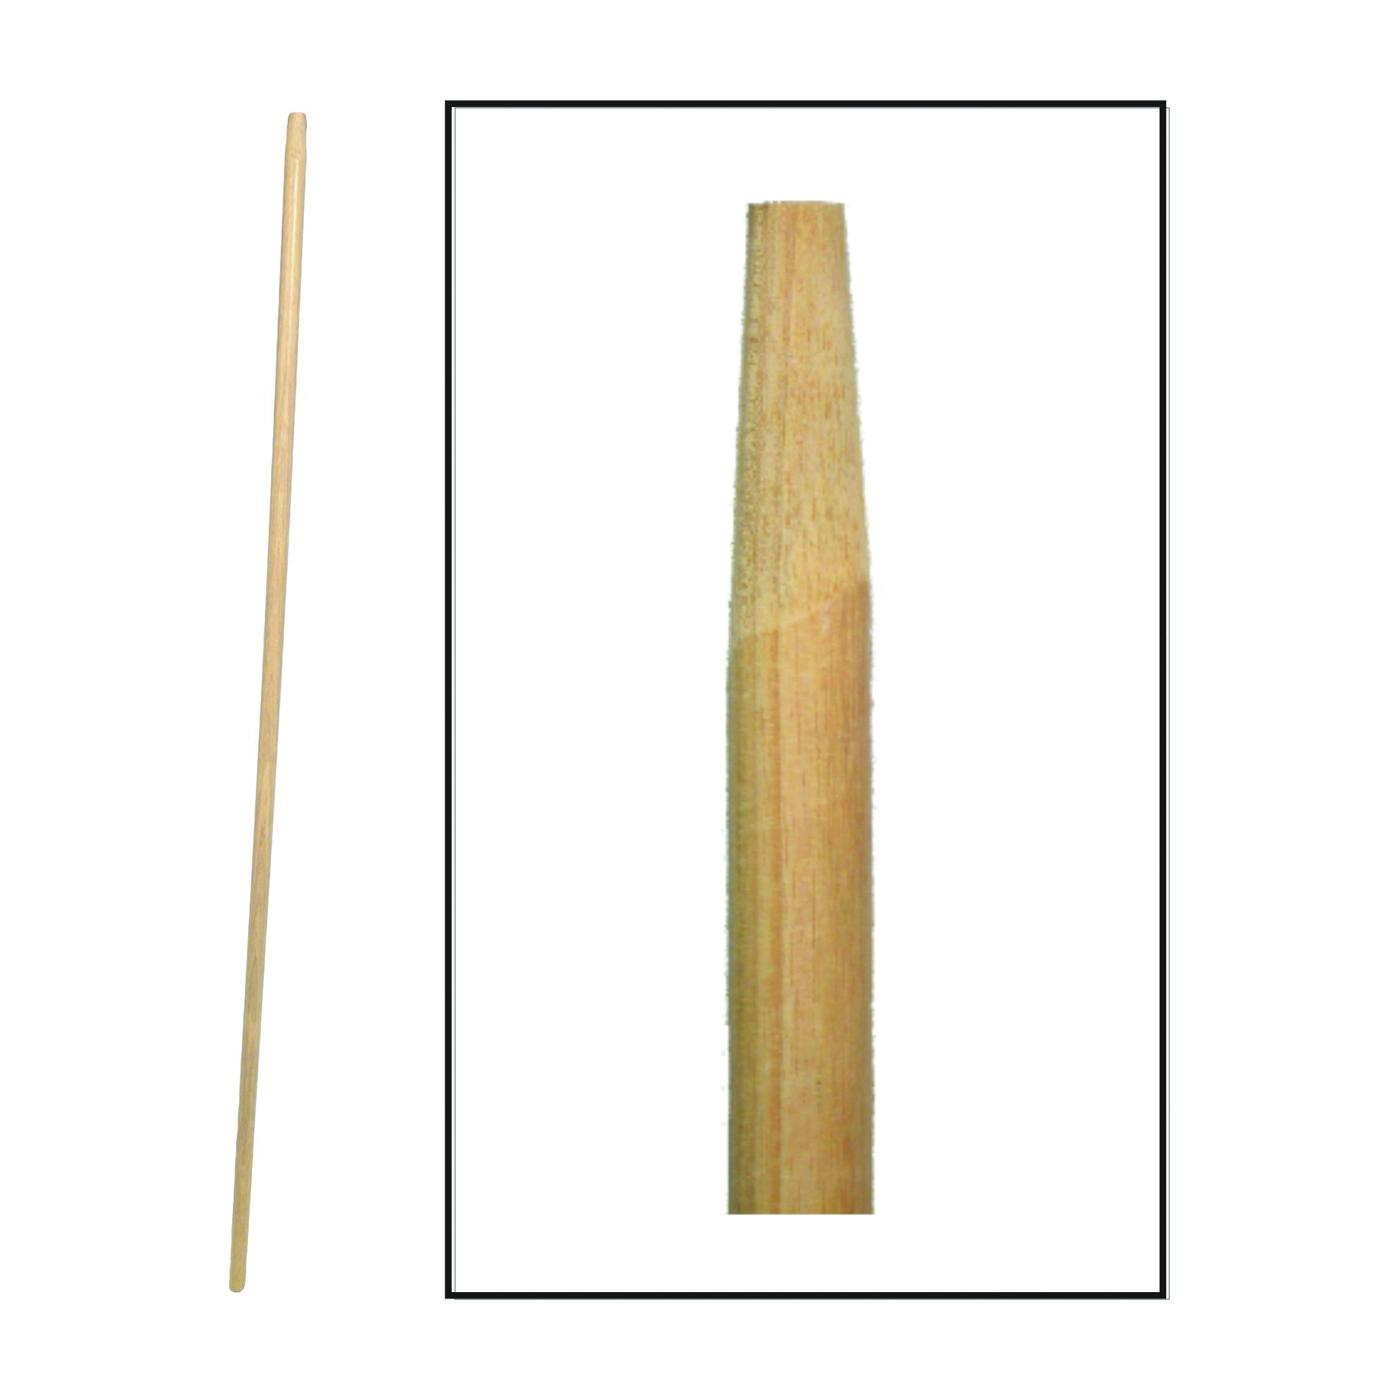 Picture of BIRDWELL 520-12 Broom Handle, 1-1/8 in Dia, 54 in L, Hardwood